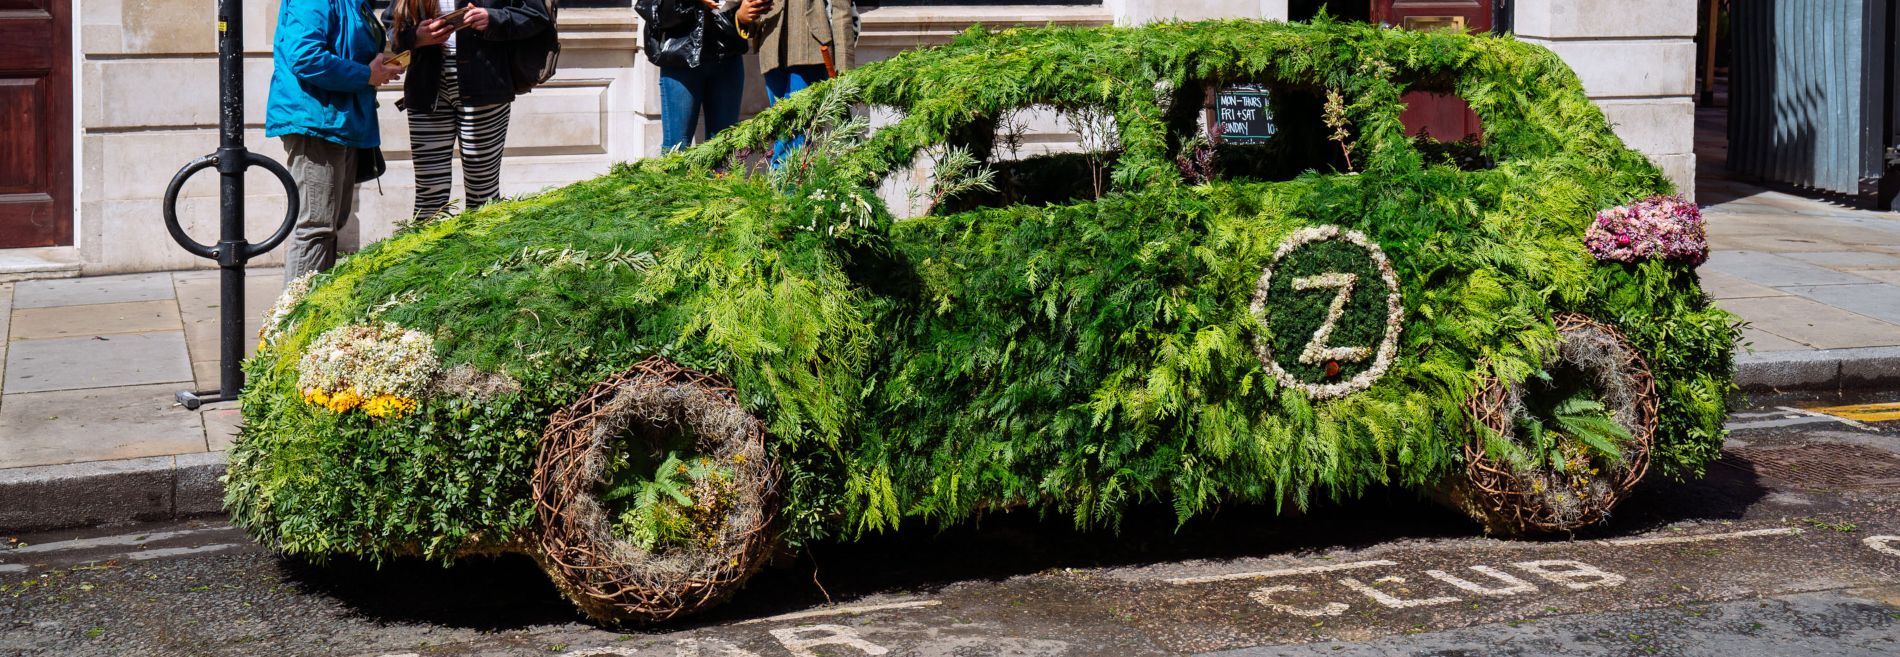 zipcar living car in spitalfields with onlookers